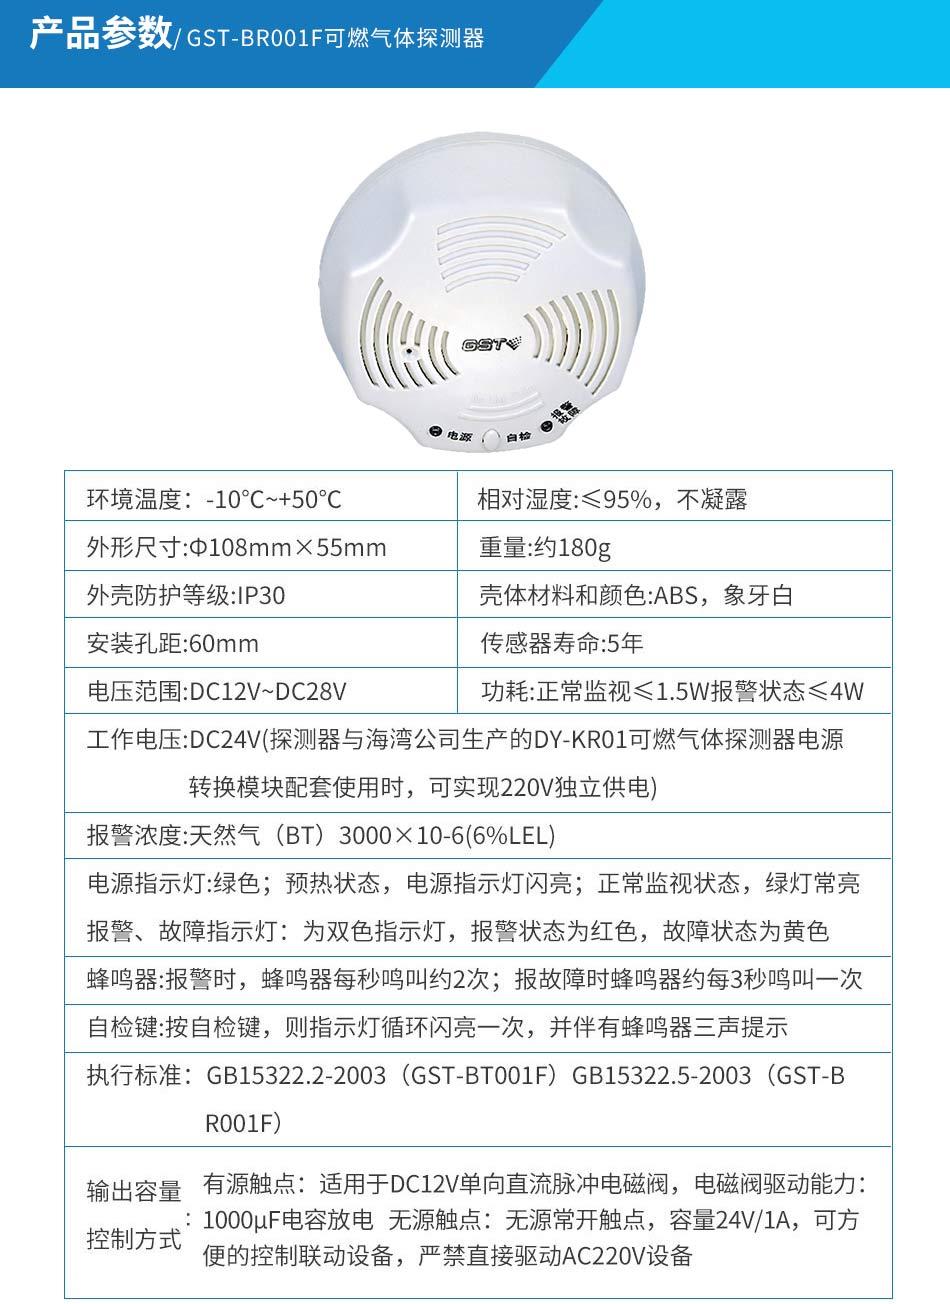 GST-BR001F可燃气体探测器参数